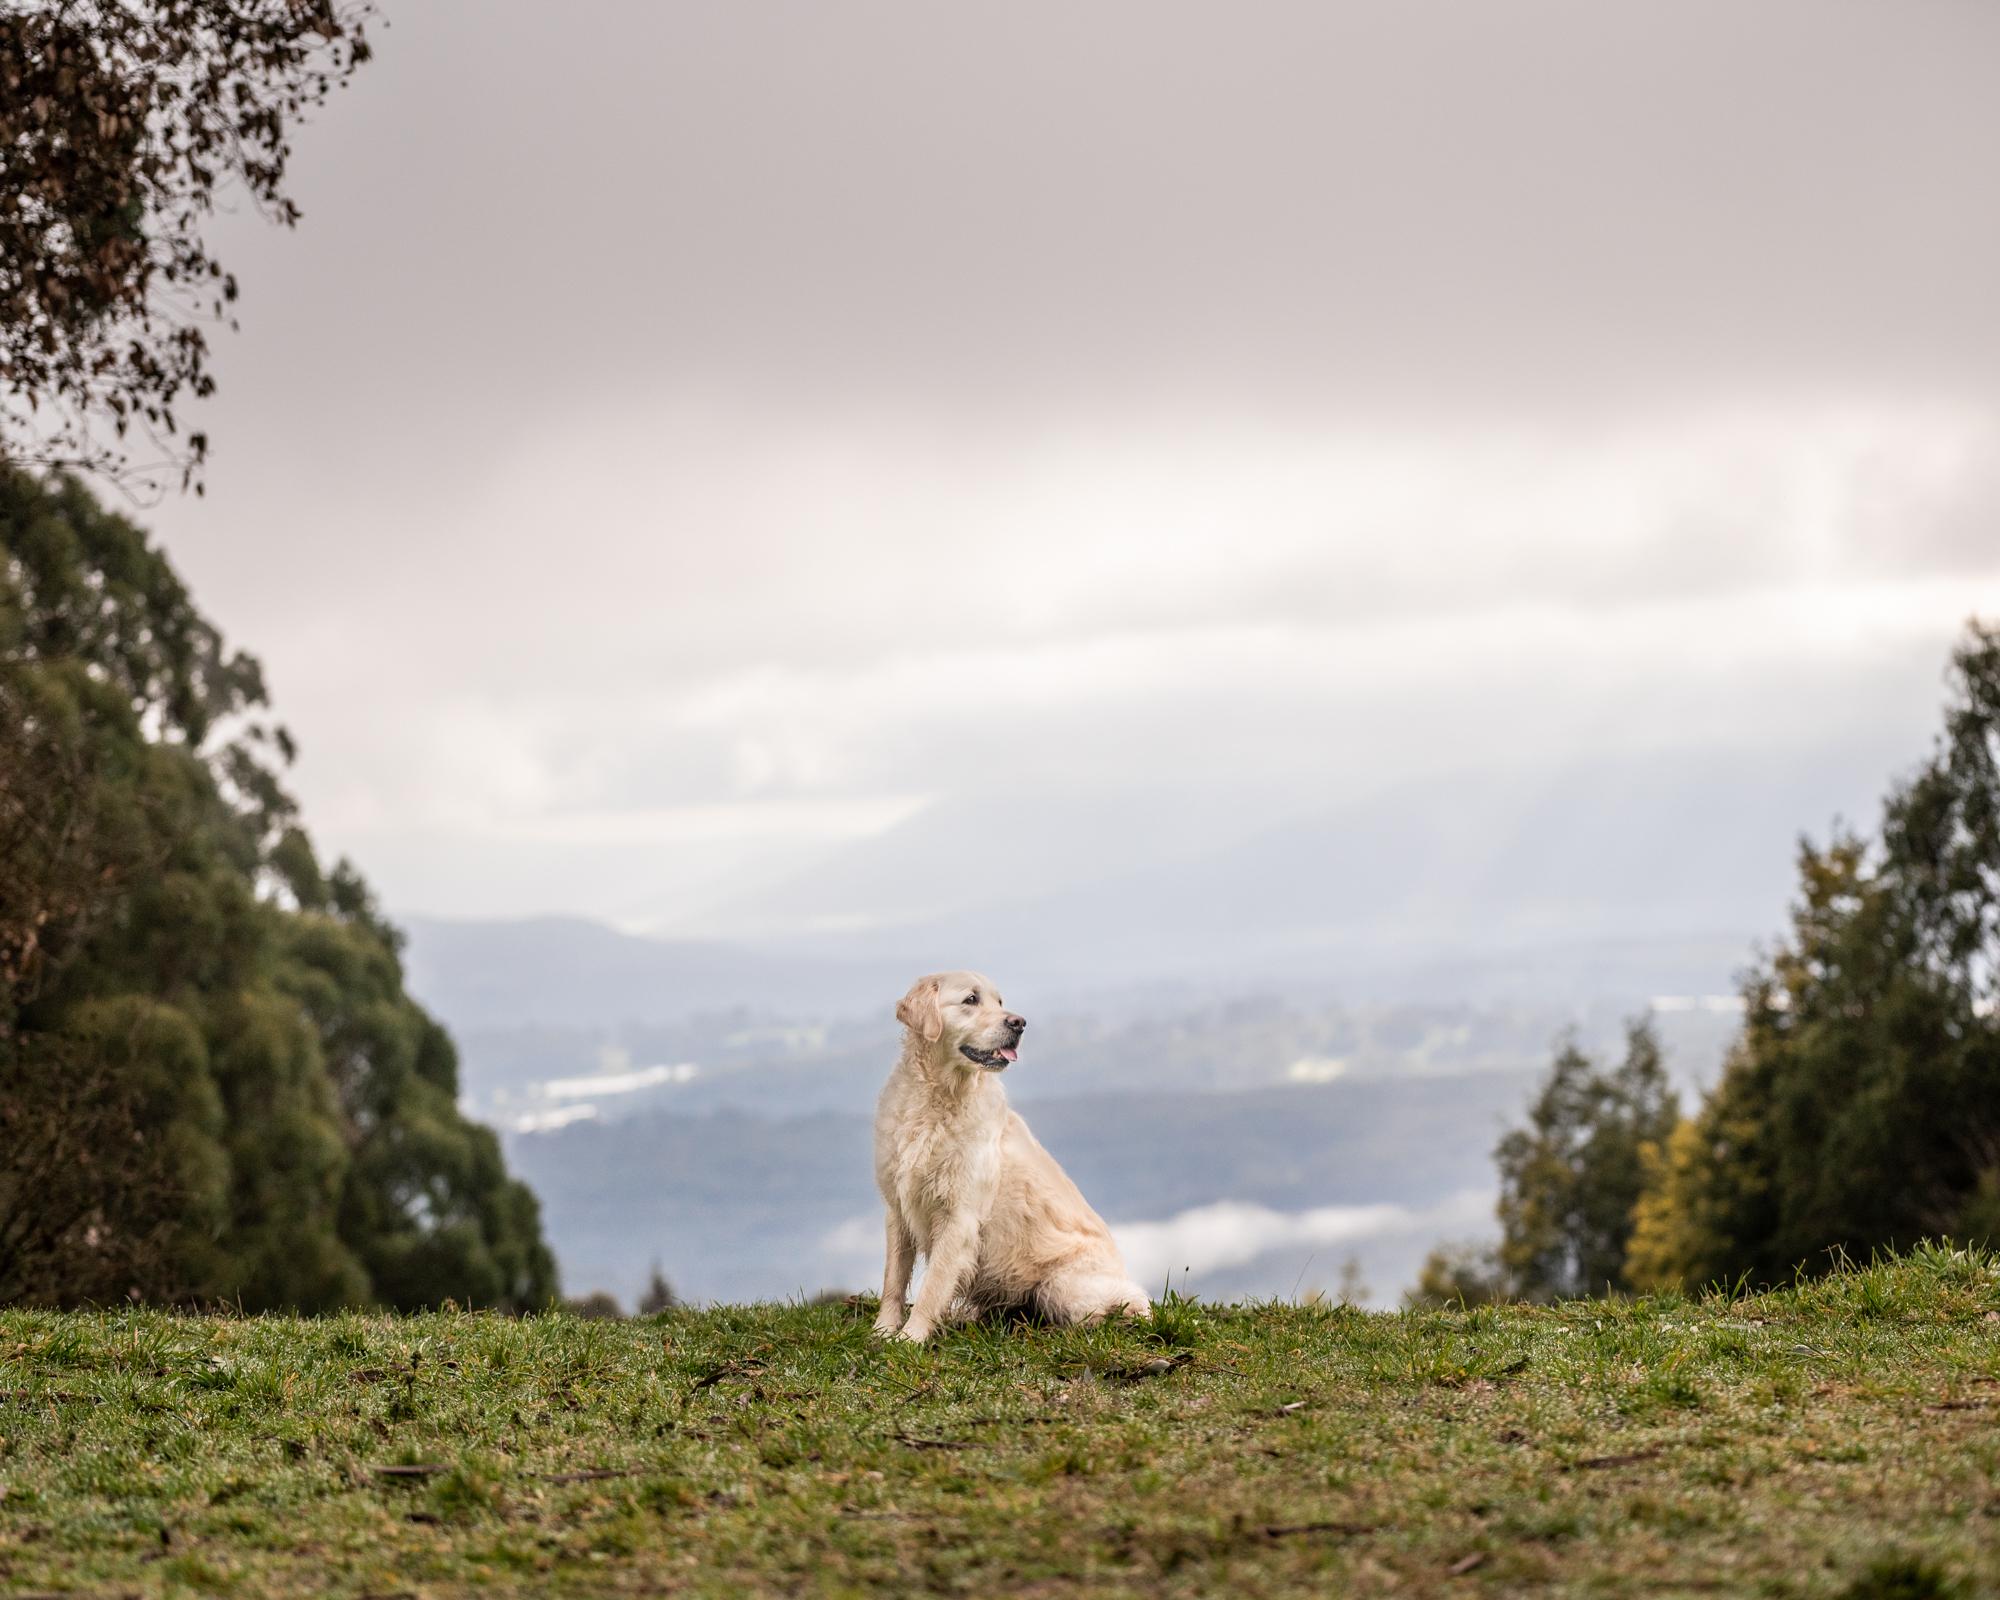 Dixon Photography, Dixon dog photography, dog photography Melbourne, location dog photography, pet photography Melbourne, Melbourne dog photographer, melbourne pet photography, dog photos Melbourne, golden retriever